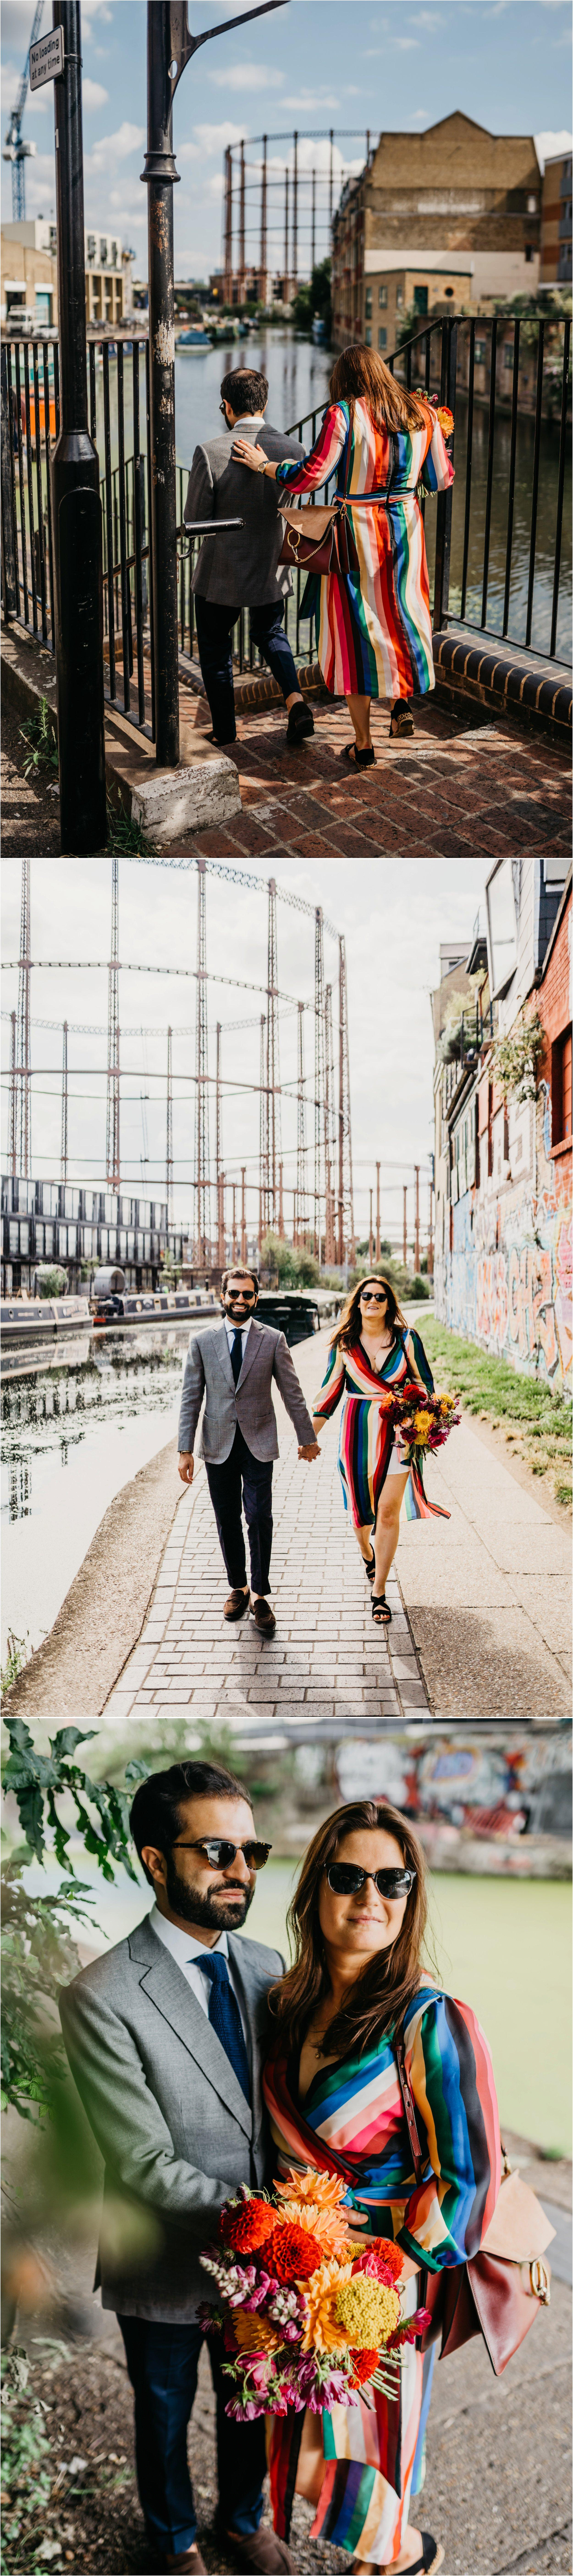 Hackney Town Hall London wedding photographer_0025.jpg